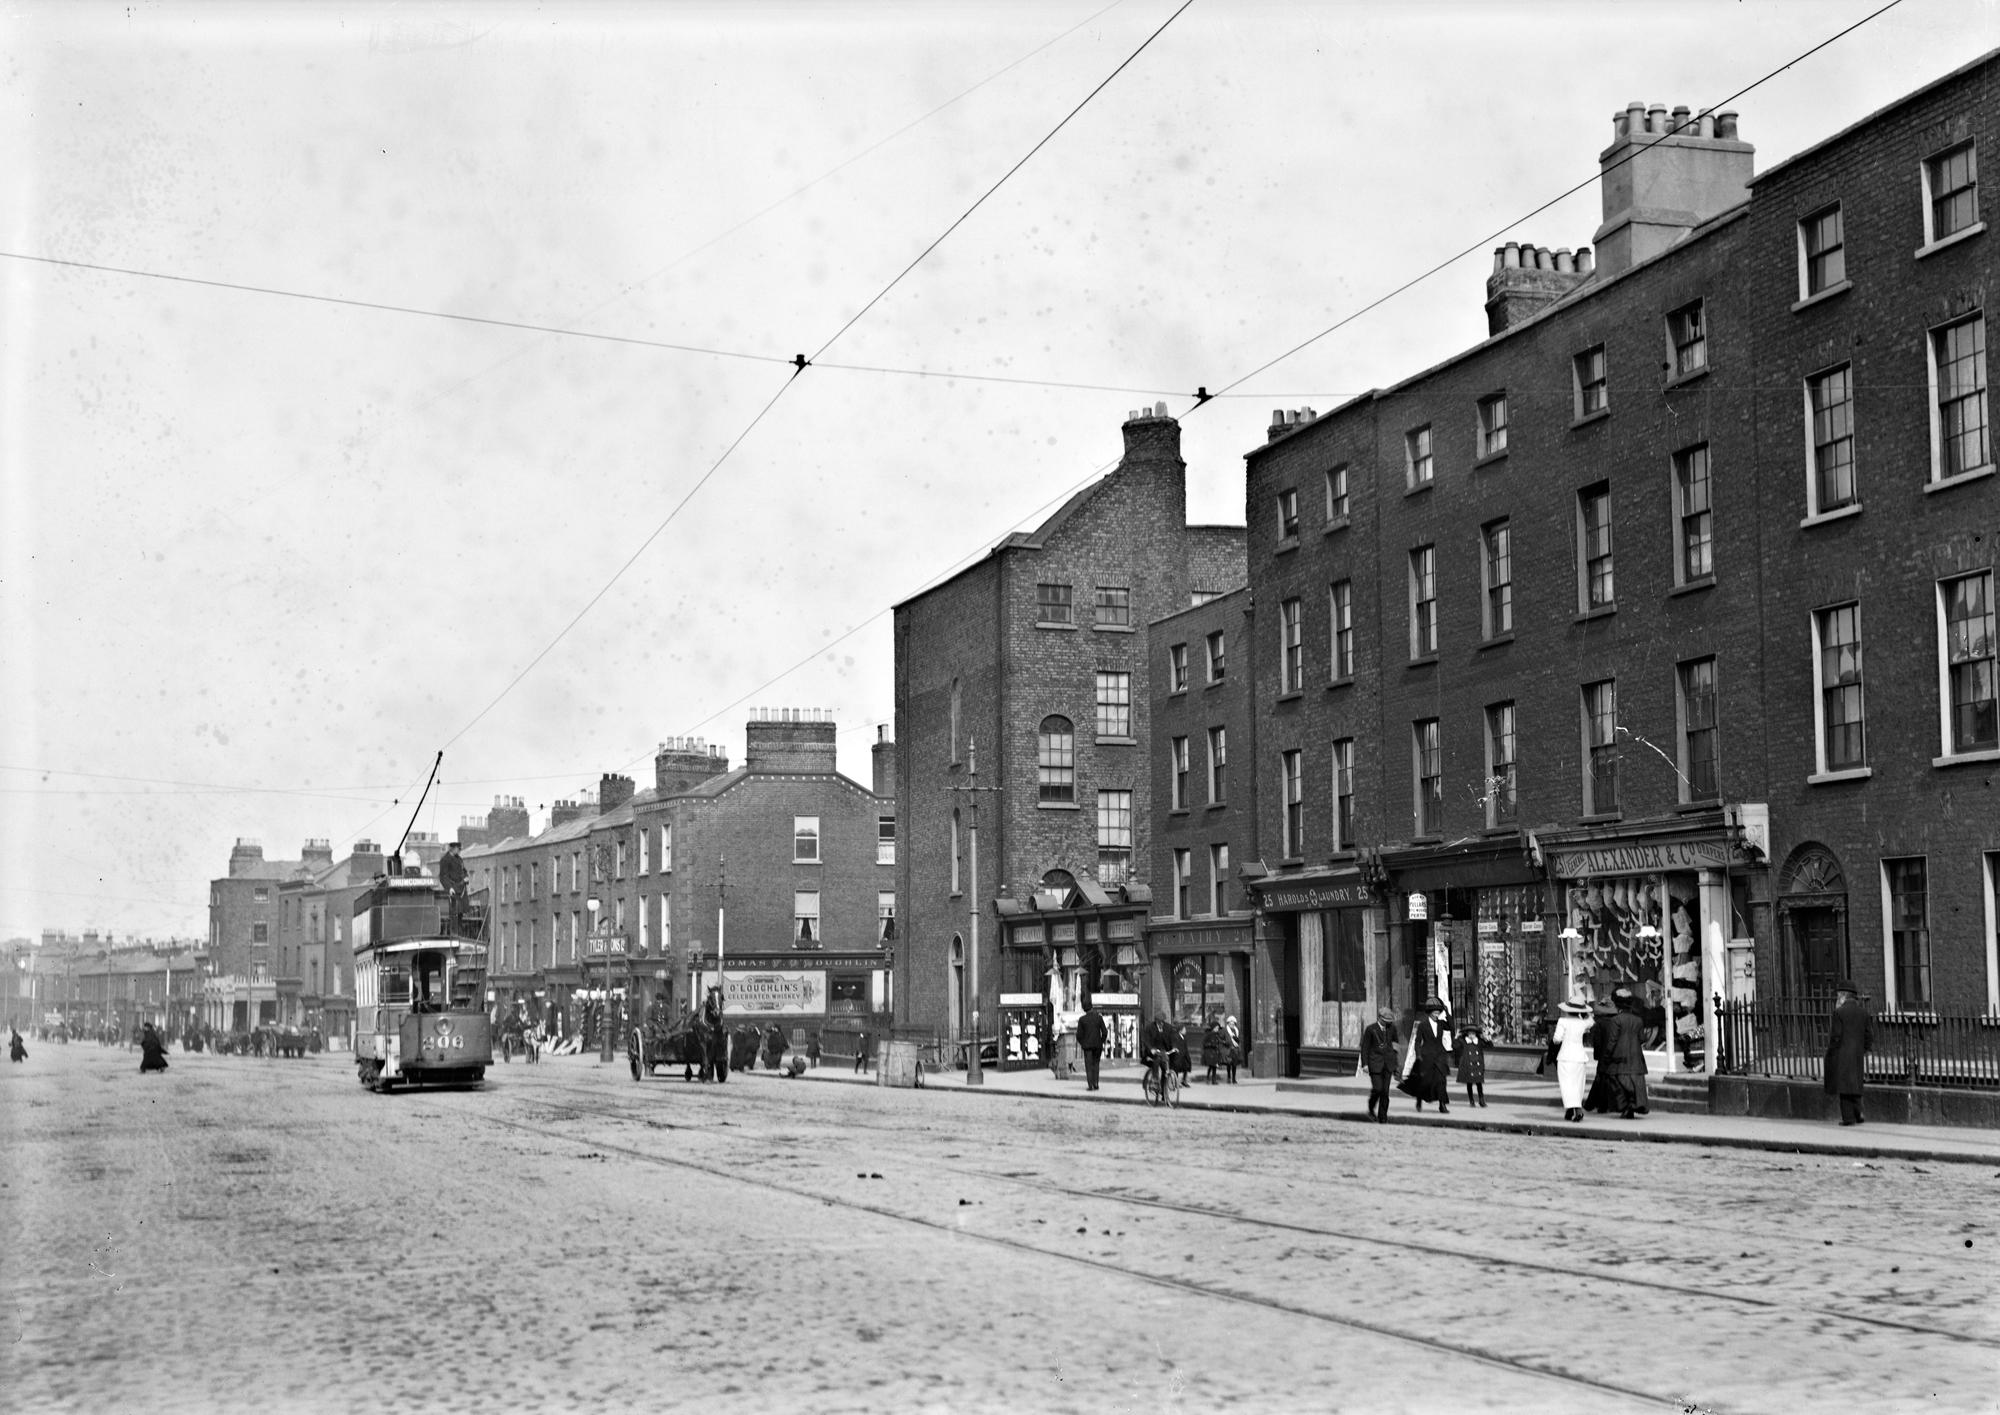 View of a Dublin Street (Dorset Street), Drumcondra, Co. Dublin